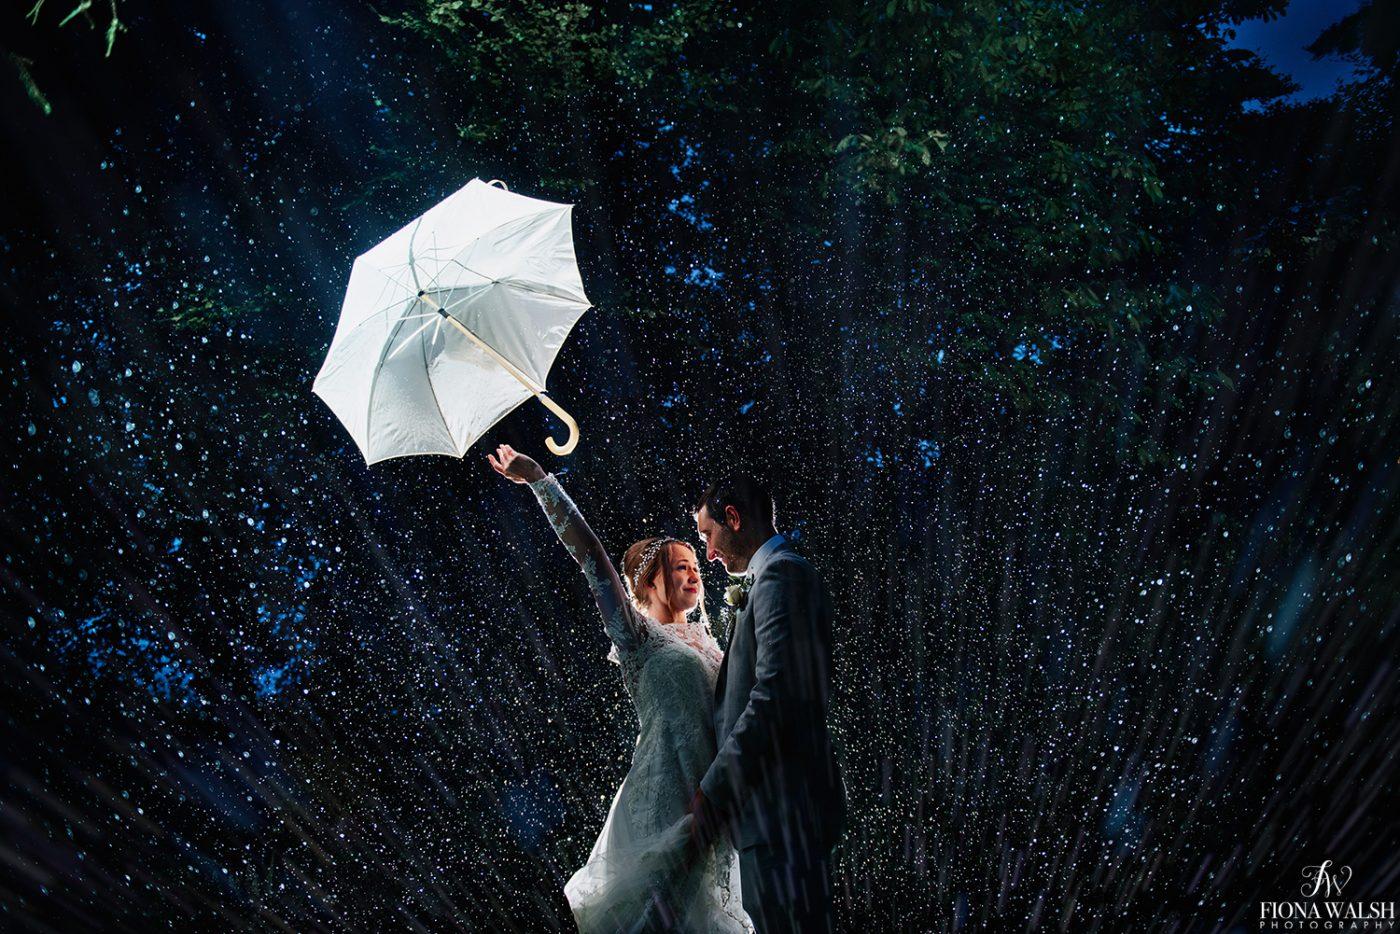 Wedding Photos in the Rain